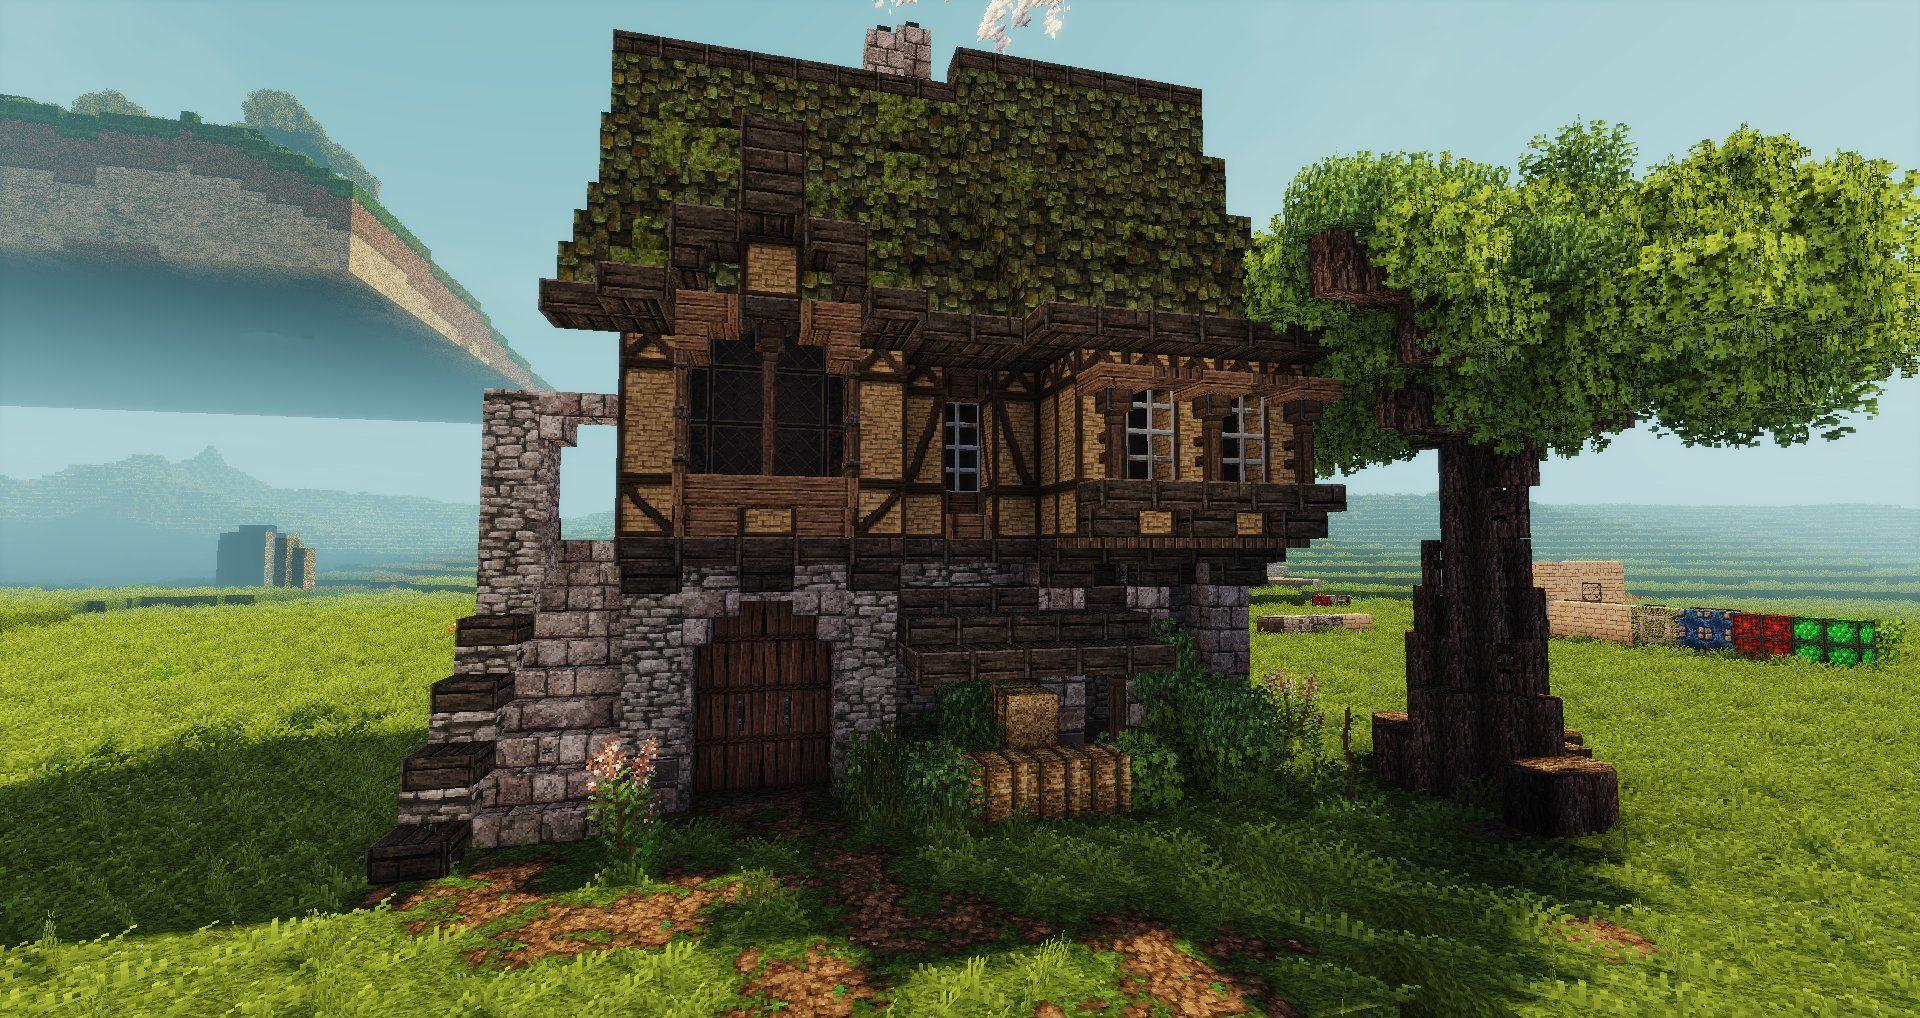 3 Twitter マインクラフトの家 マインクラフトの建物 マイクラ 建築